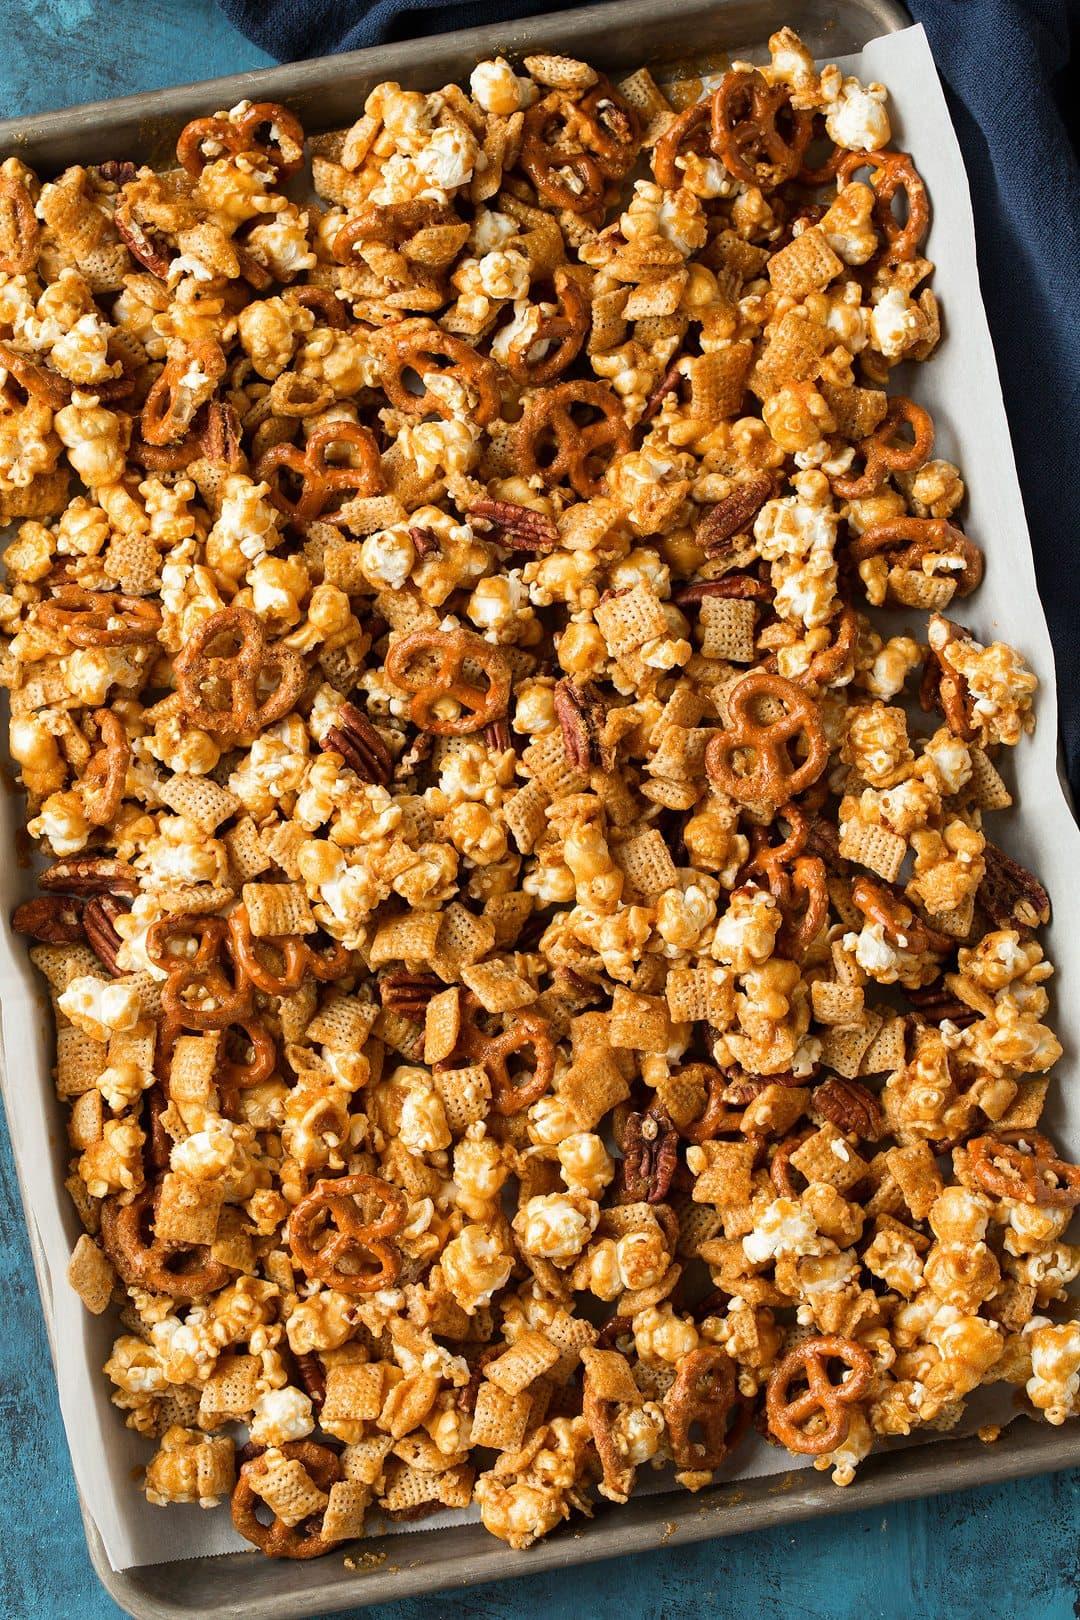 Crunchy Caramel Corn Snack Mix